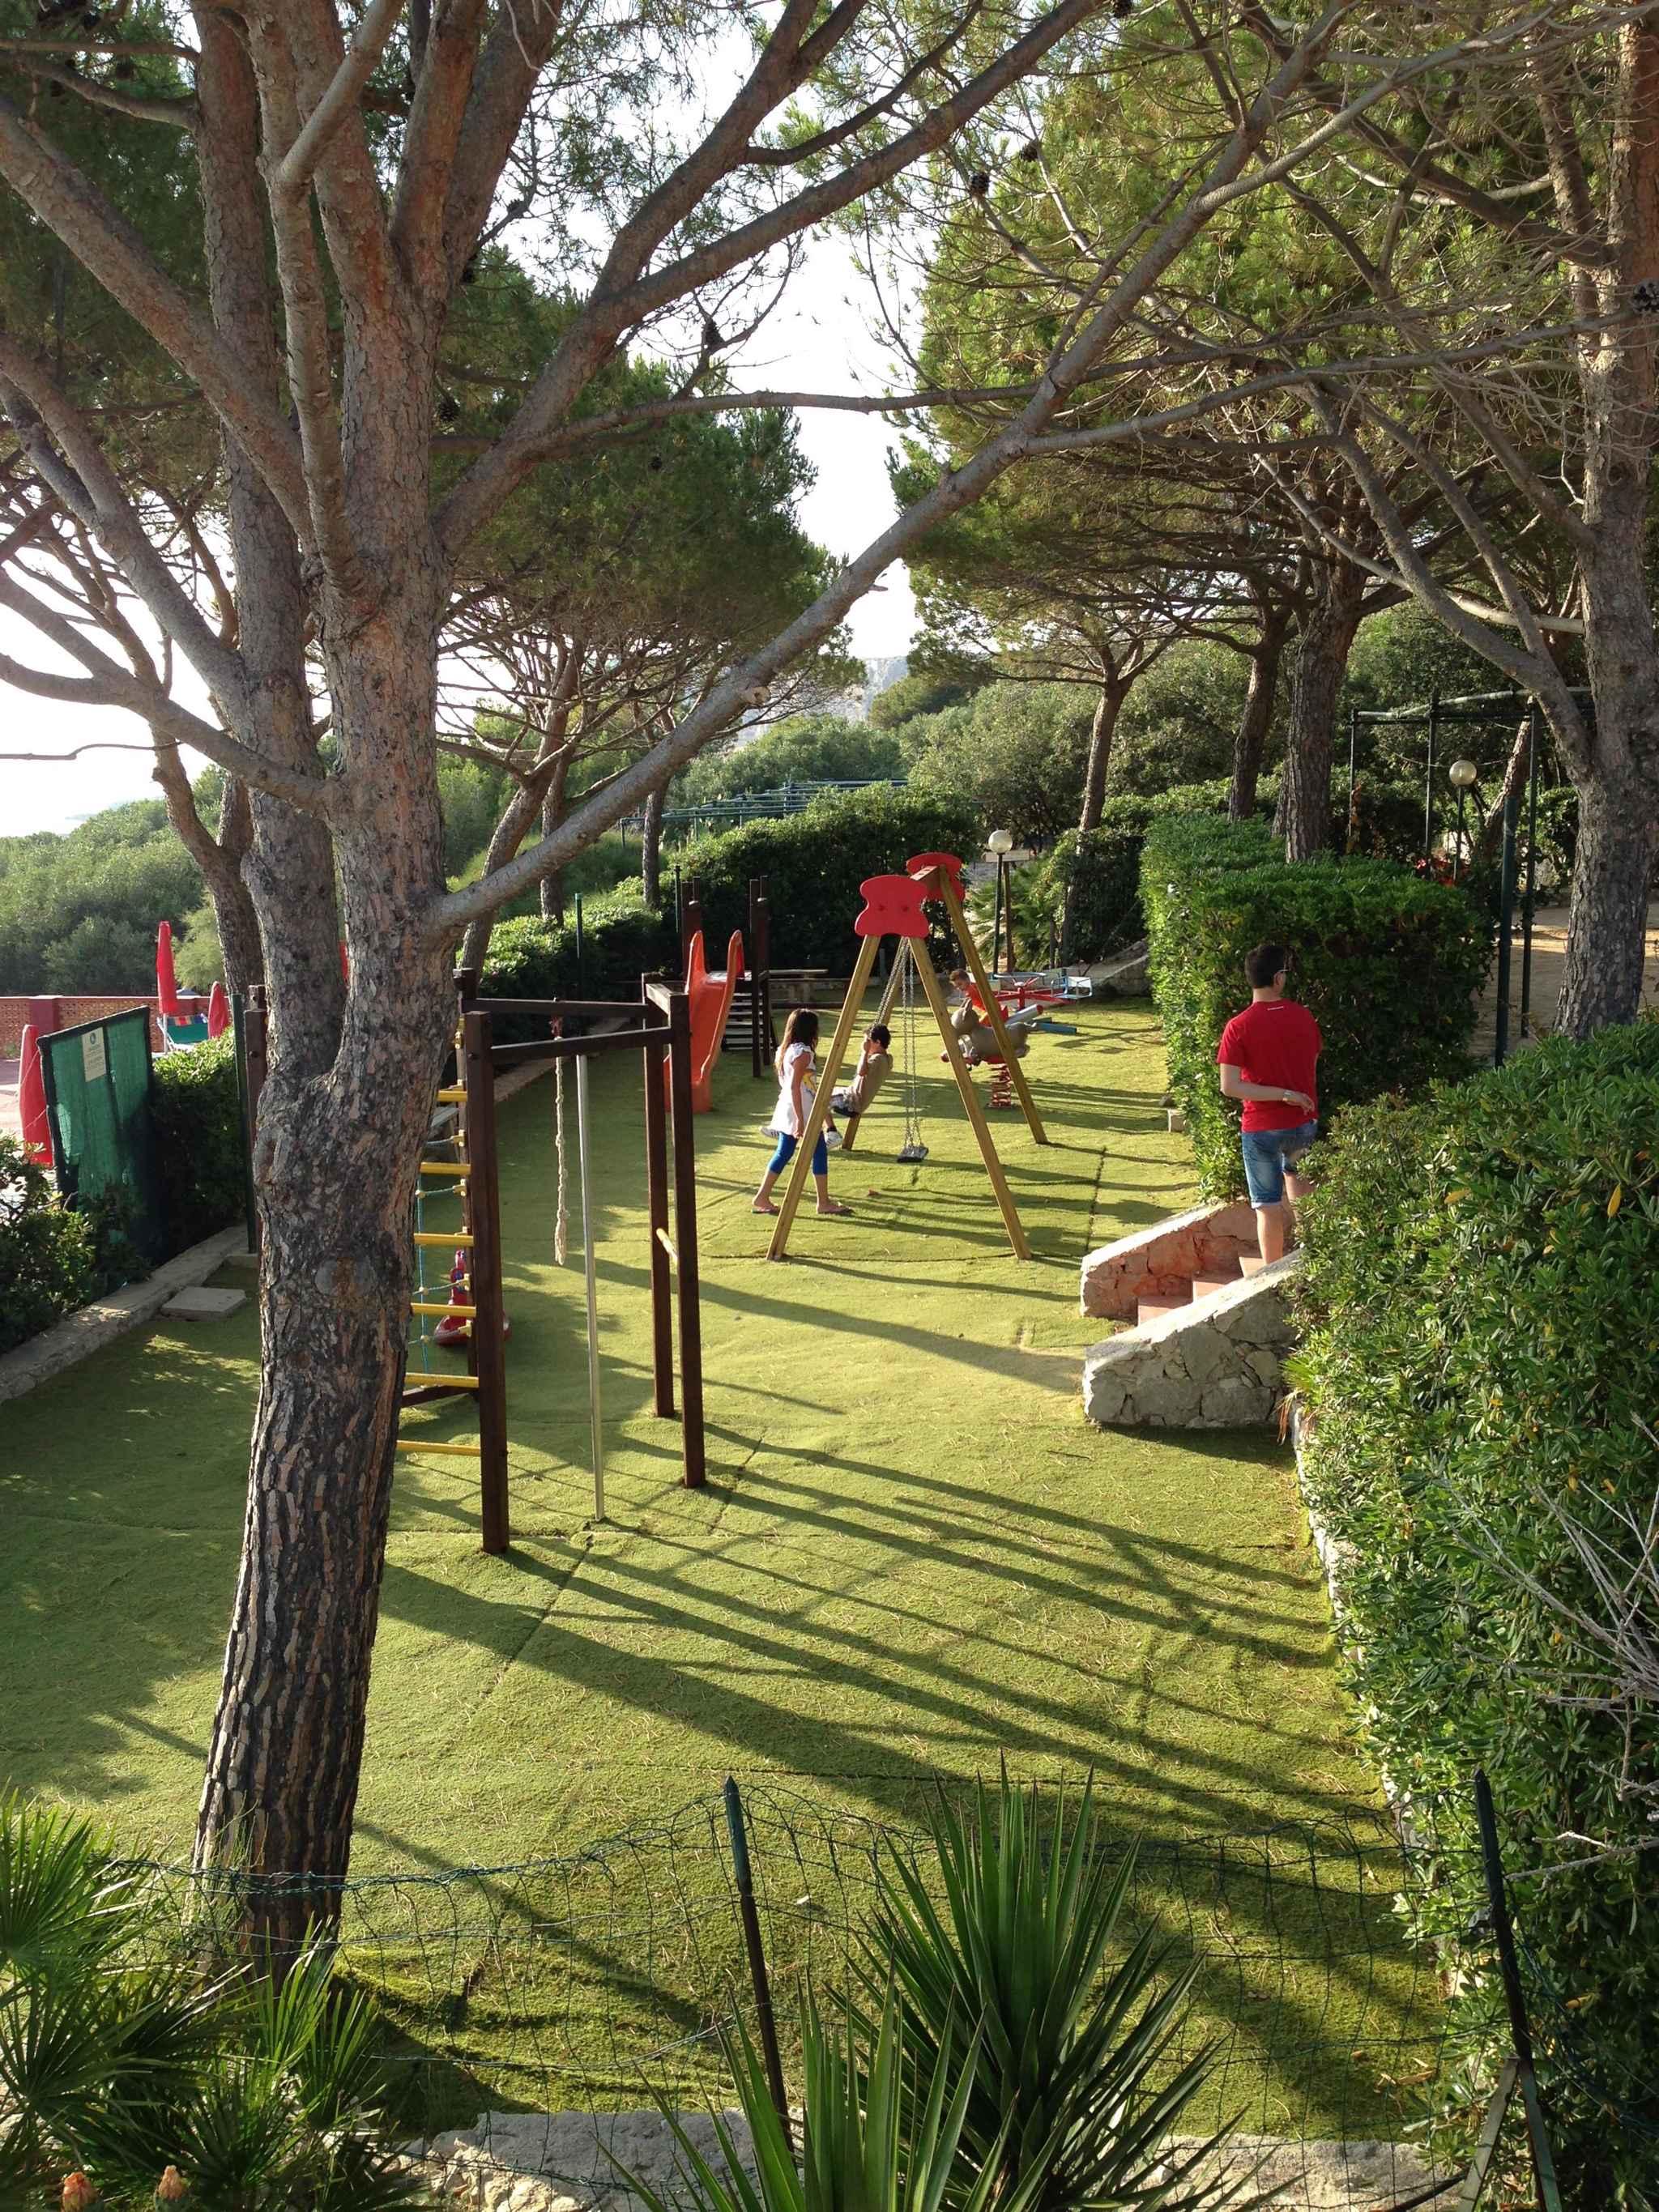 Appartement de vacances Mobilehome mit Tischtennis und Fahrradverleih (2483443), San Vito Lo Capo, Trapani, Sicile, Italie, image 10